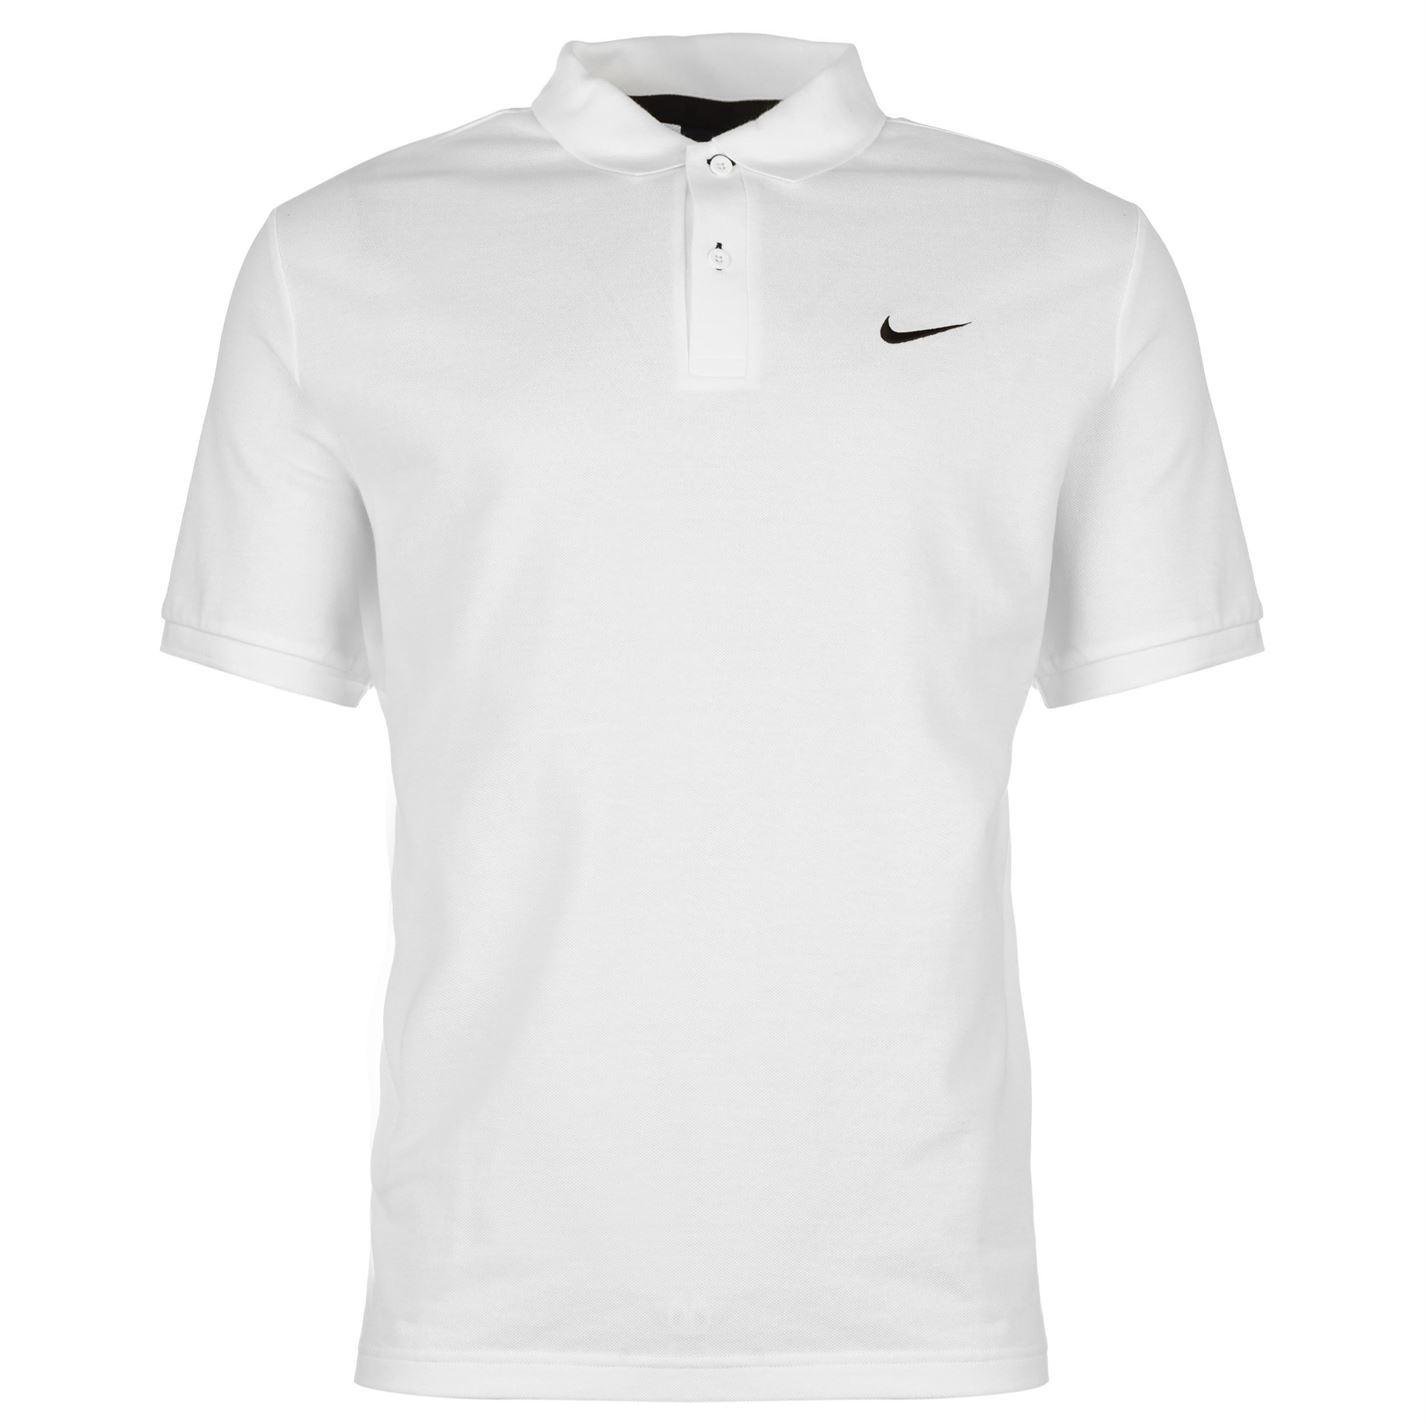 Nike Pique Polo Shirt Mens White Top T Shirt Tee